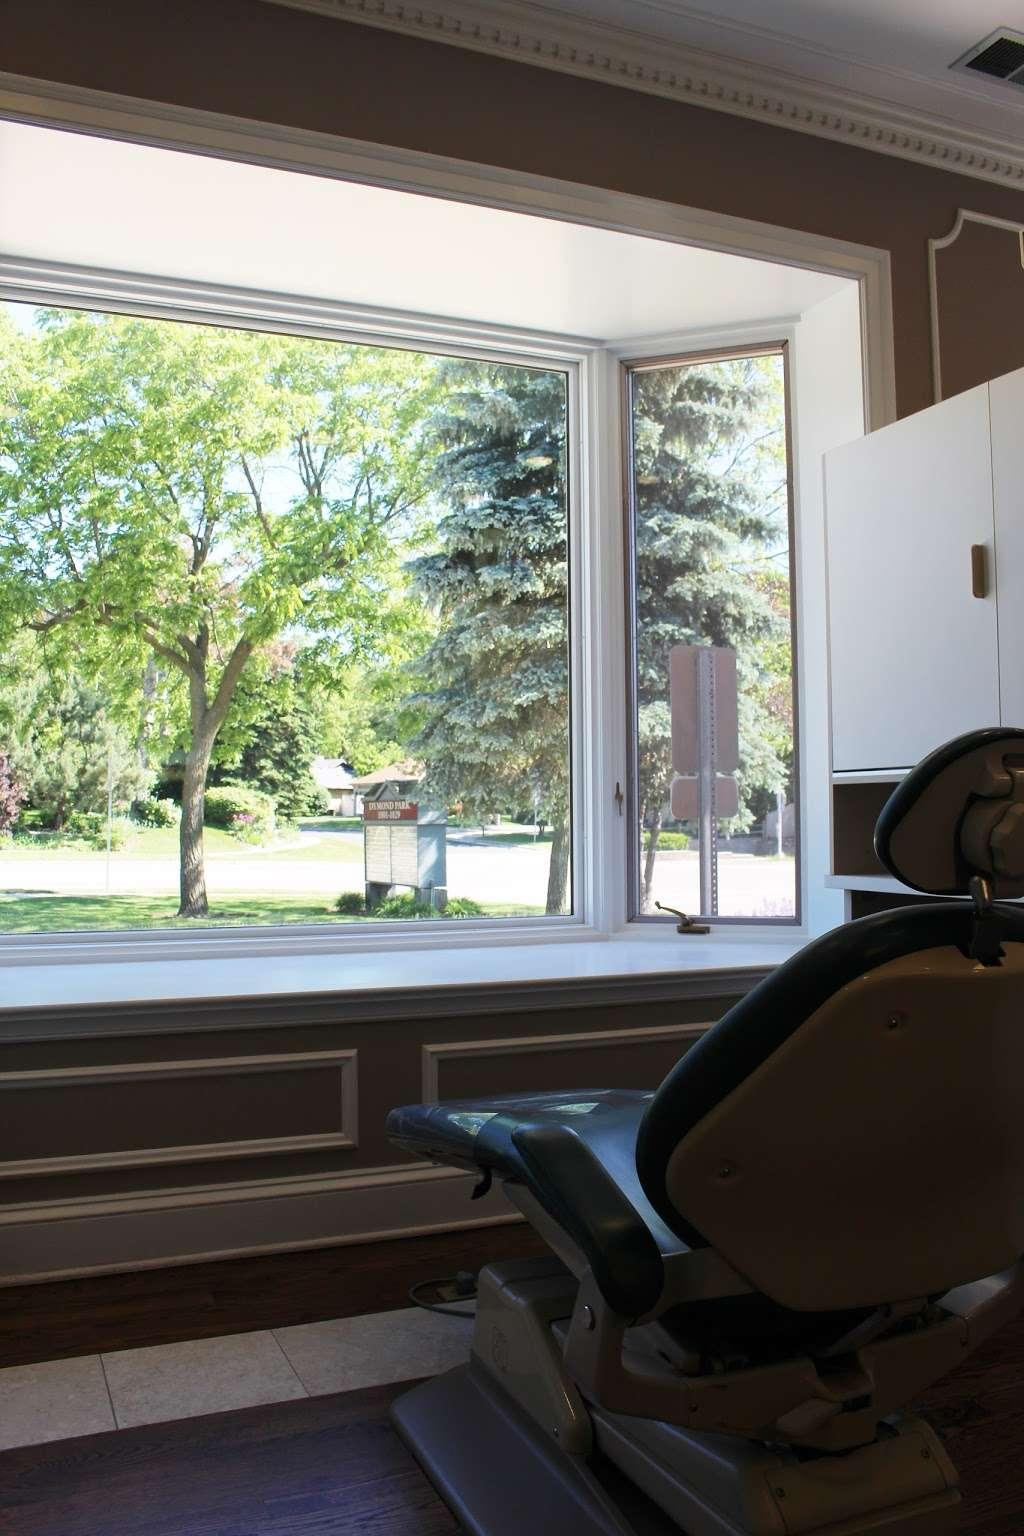 Park Avenue Dental Professionals - dentist  | Photo 8 of 10 | Address: 1001 W Park Ave, Libertyville, IL 60048, USA | Phone: (847) 918-1255